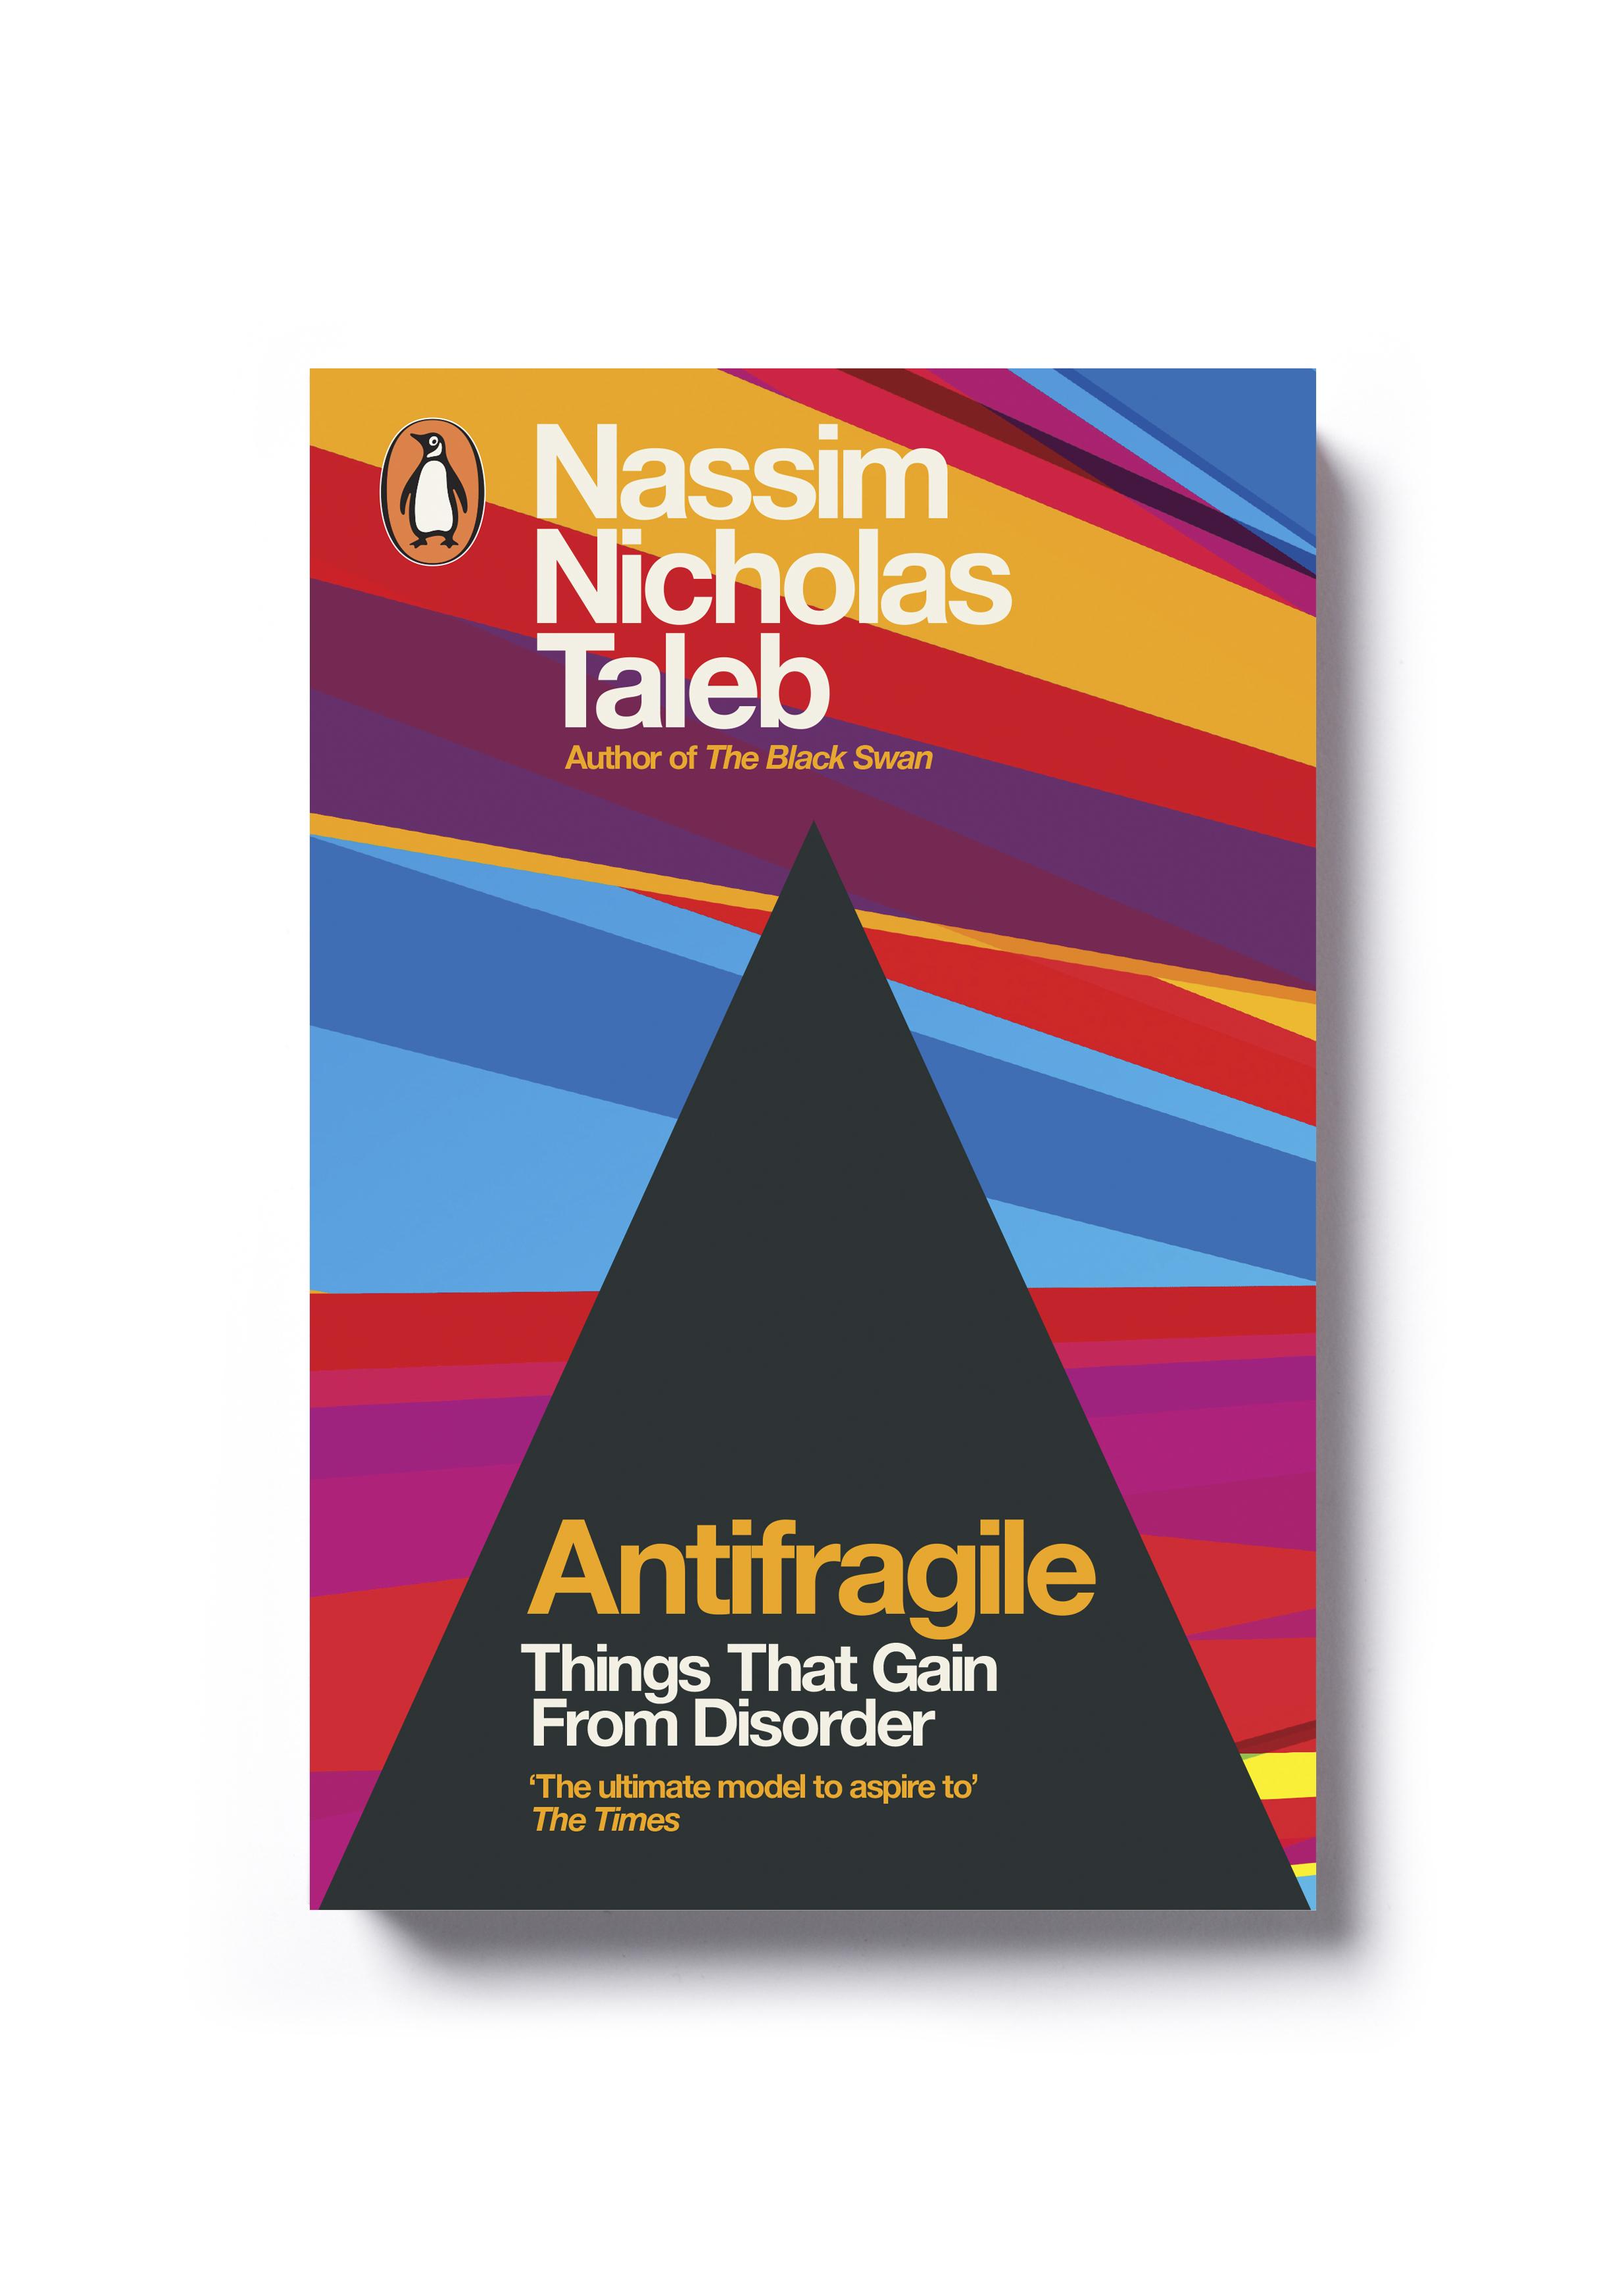 Antifragile by Nassim Nicholas Taleb (paperback) - Design: Jim Stoddart